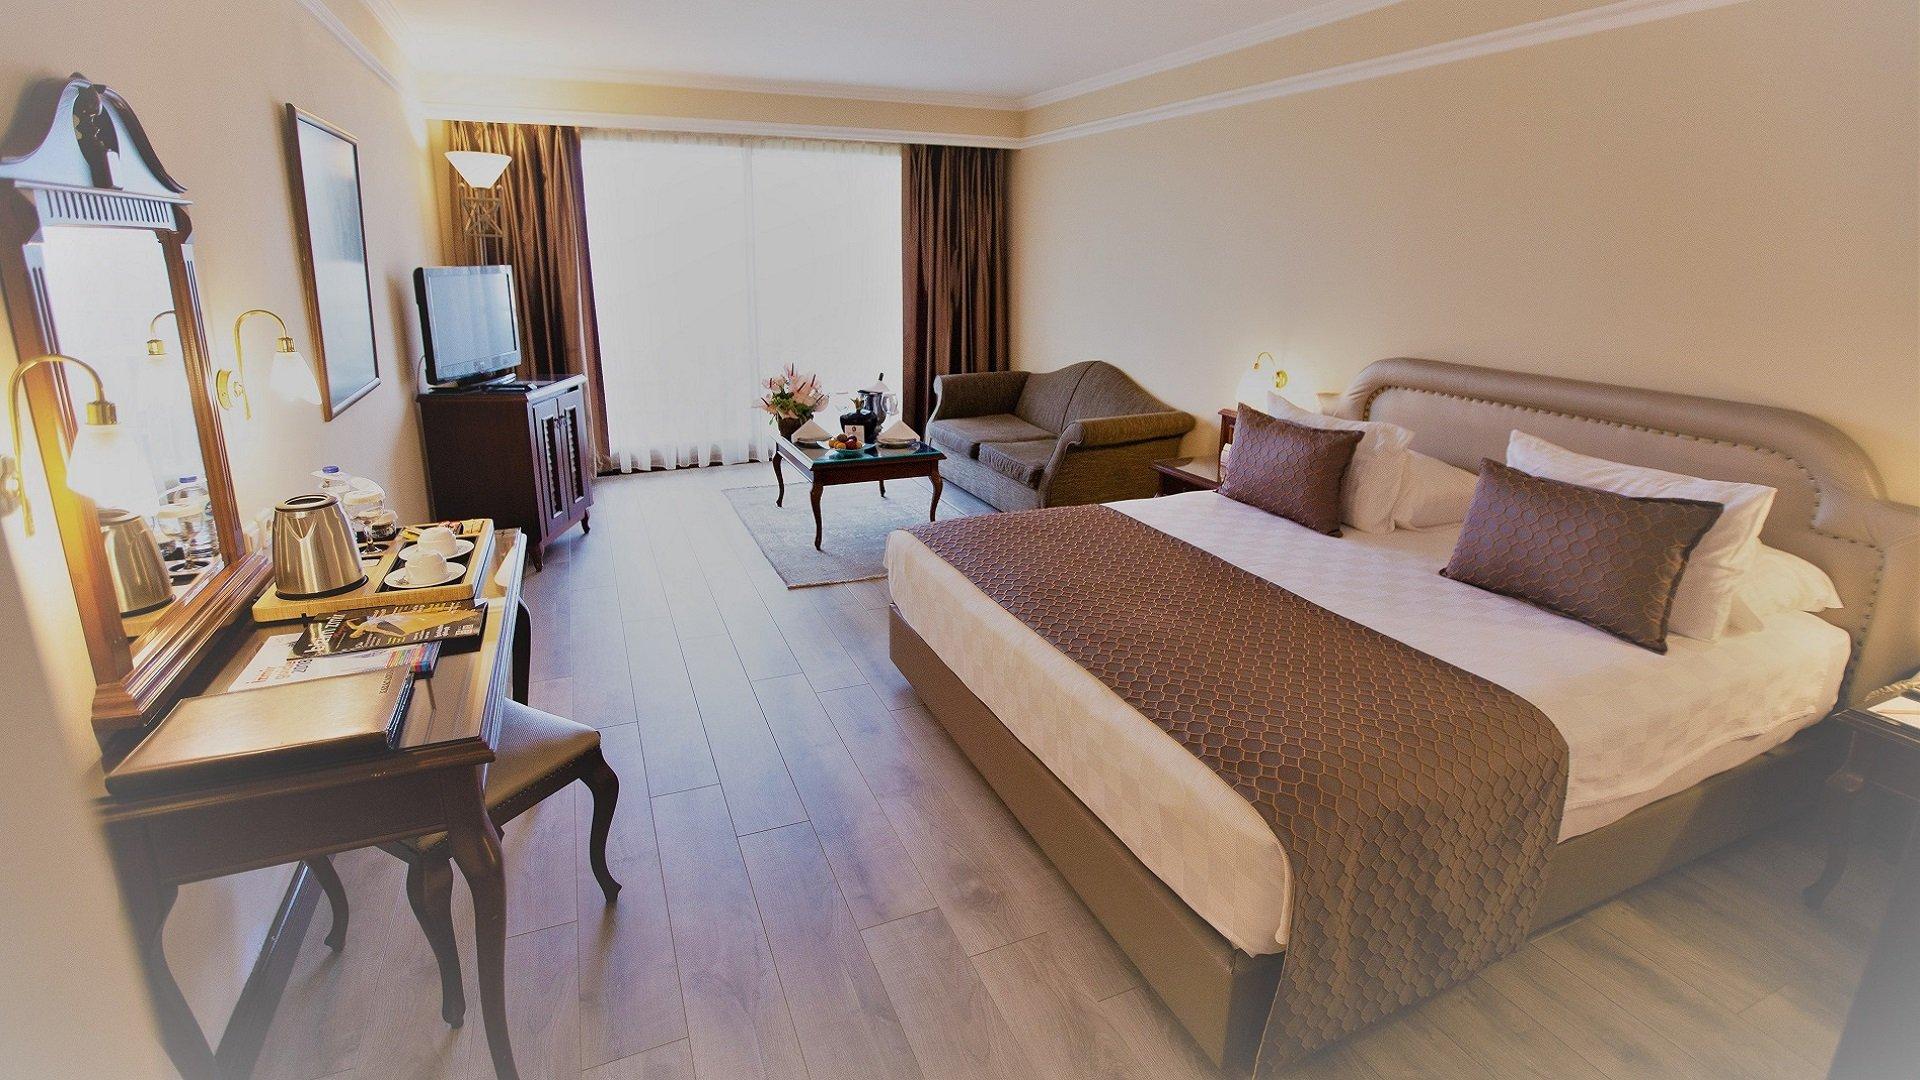 WELCOME TO KARACA HOTEL